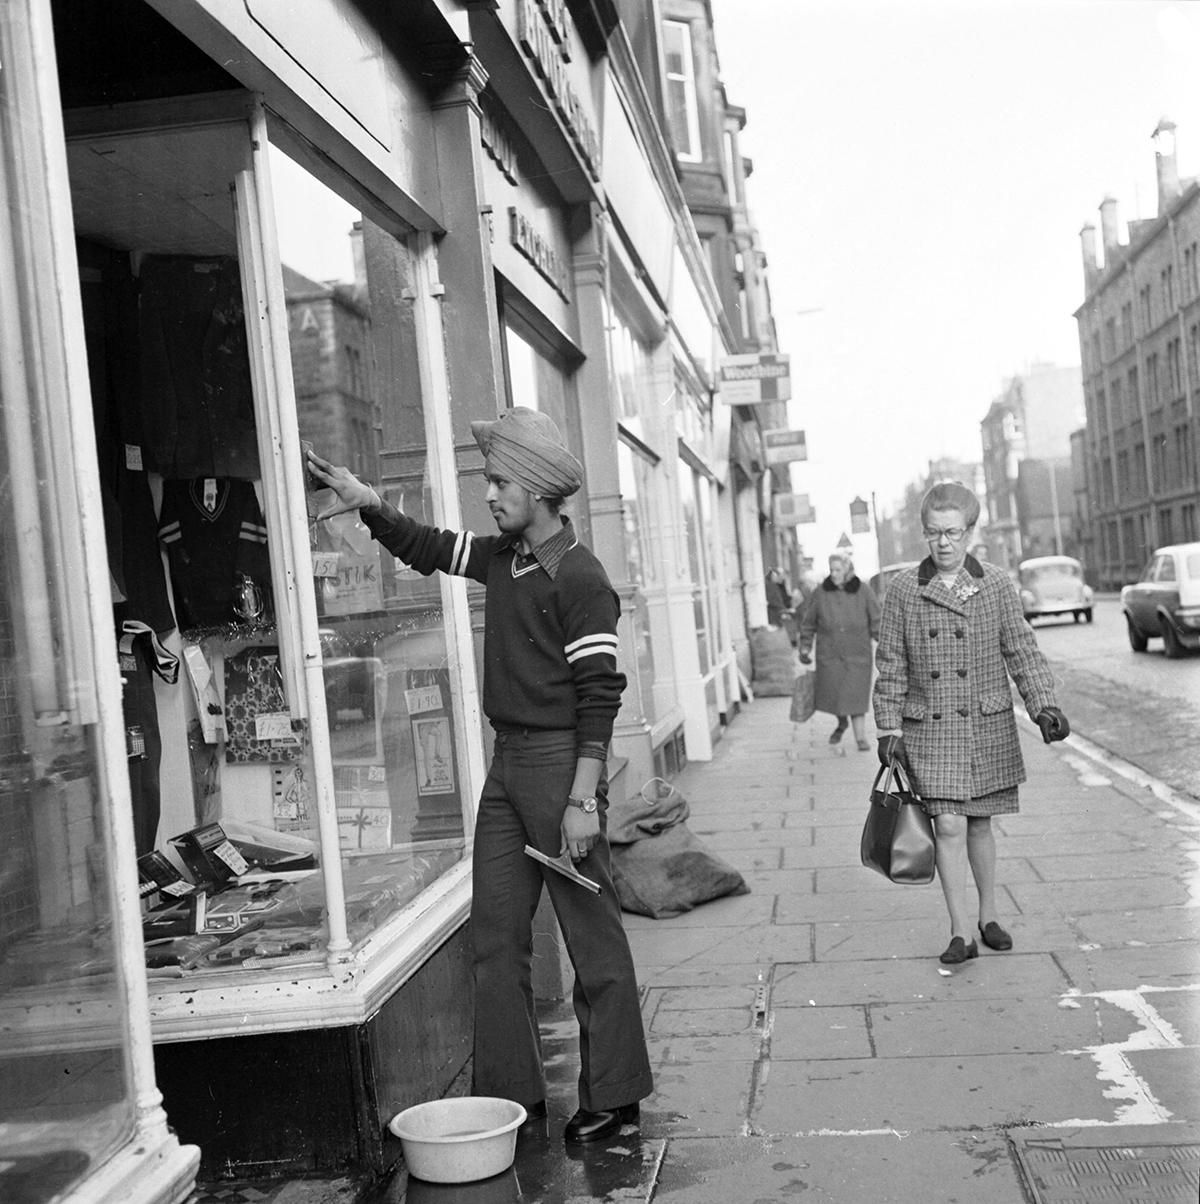 asian teenager in turban washing a shop window